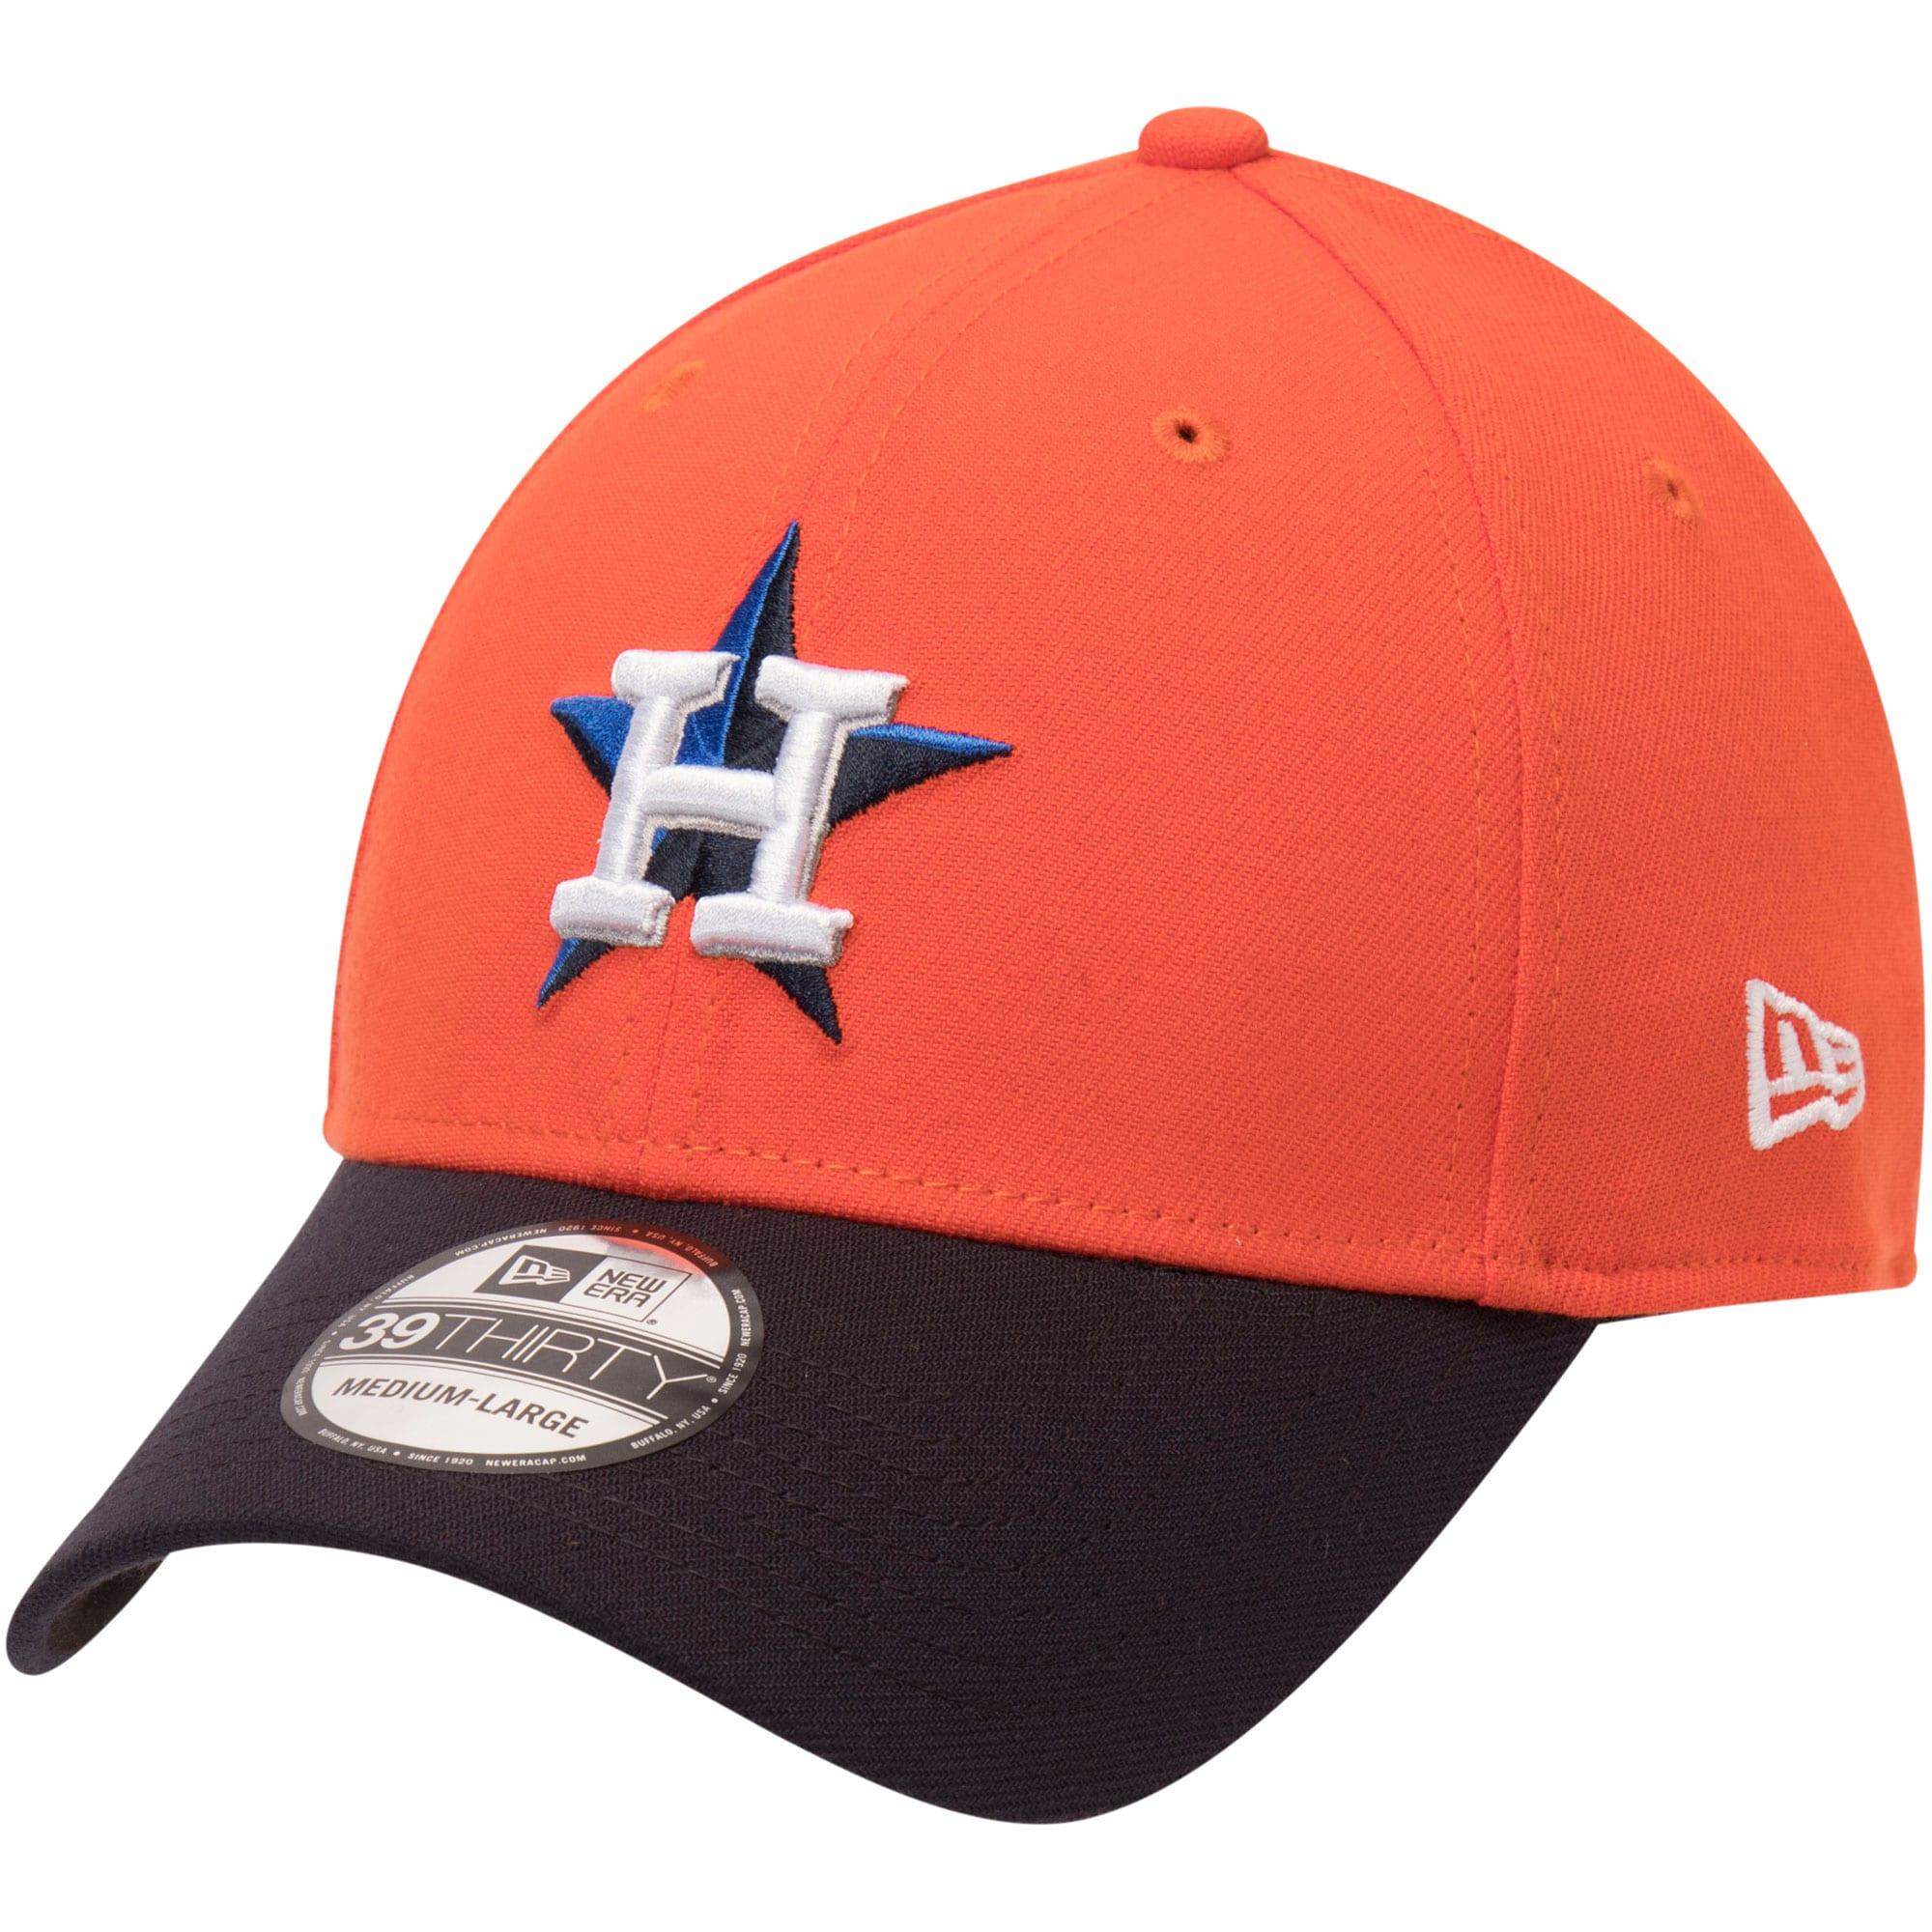 Houston Astros New Era Alternate Team Classic 39THIRTY Flex Hat - Orange/Navy